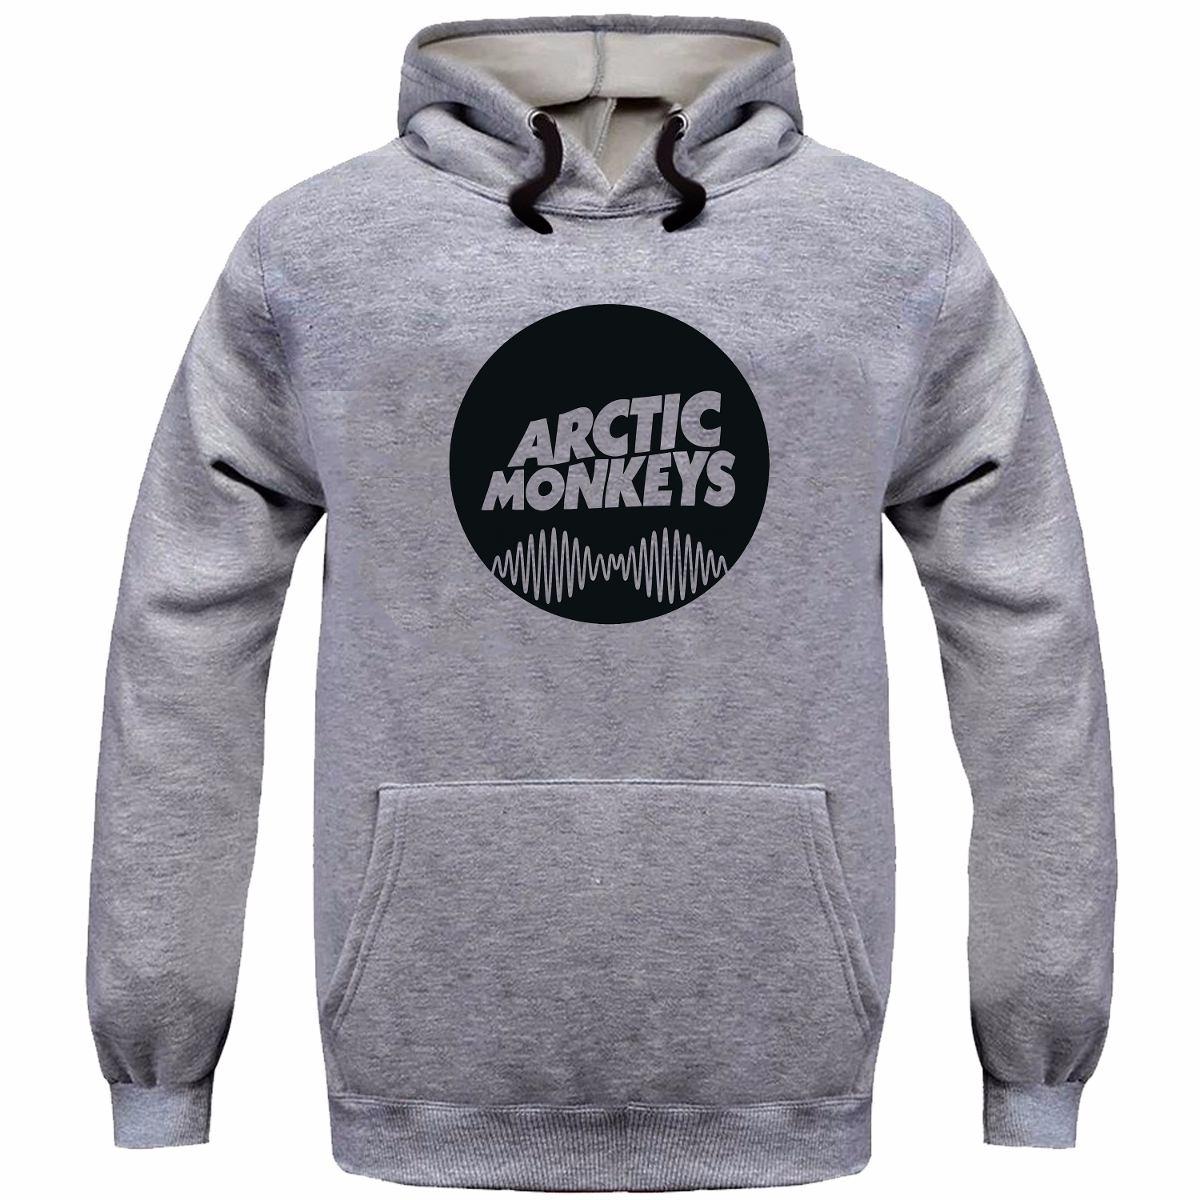 Blusa Moleton Arctic Monkeys Frete Grtis Promoo R 6387 Em Hoodie Mercado Livre